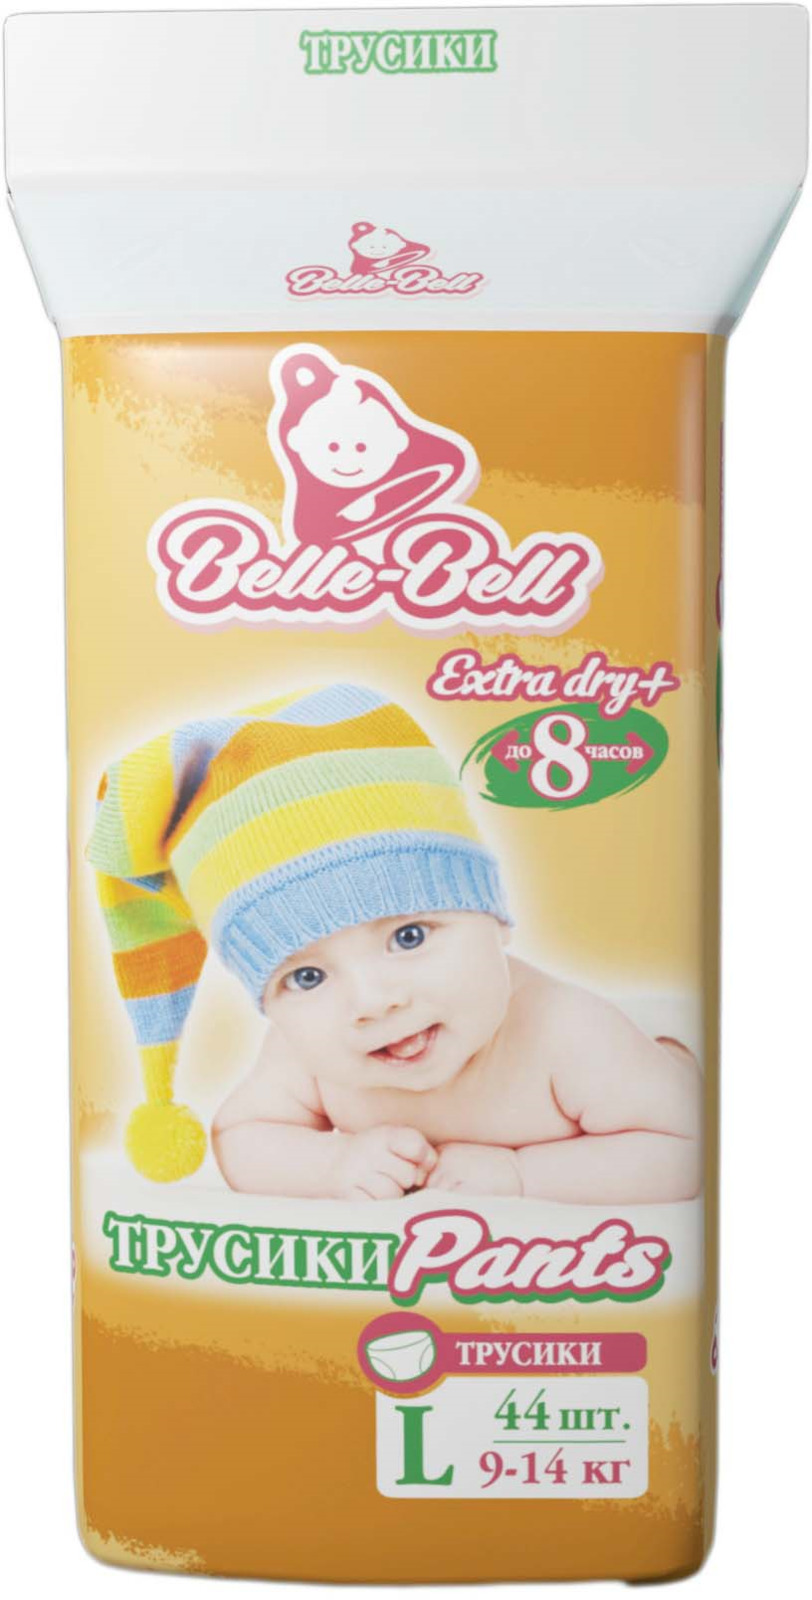 Подгузники-трусики Belle-Bell Extra dry+, размер L, 9-14 кг, 44 шт r47 belle page 8